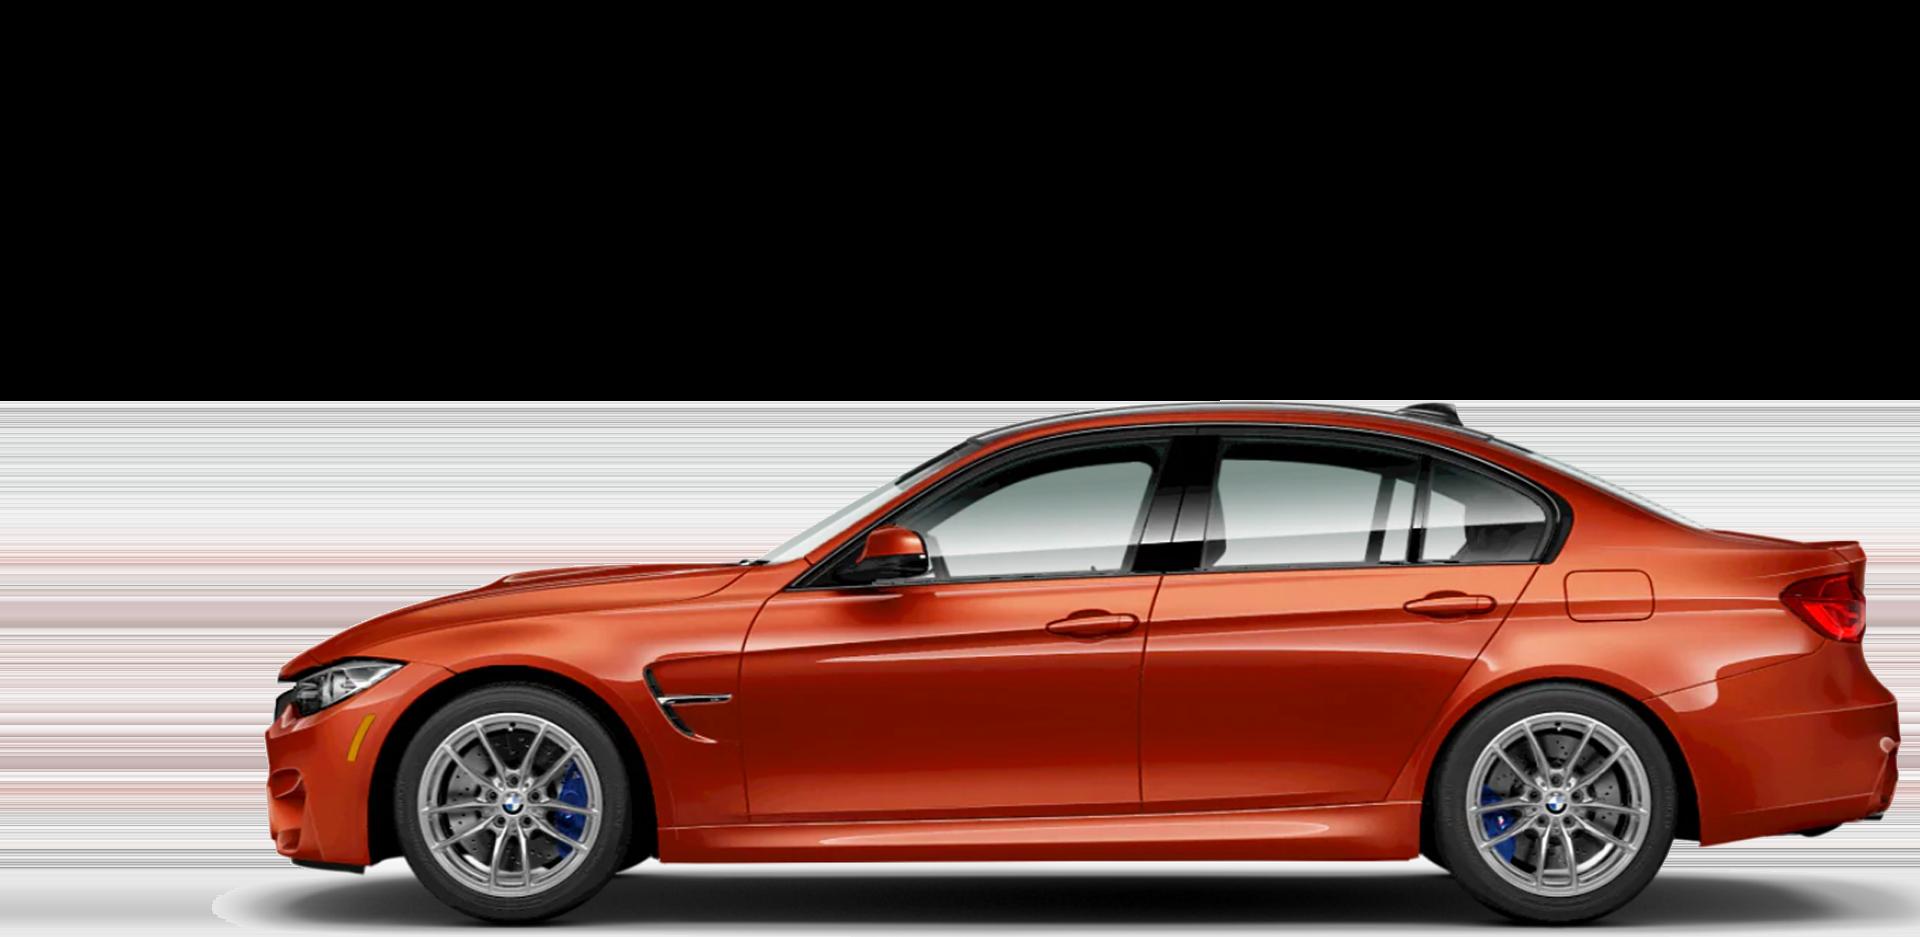 M3 Models BMW Century West BMW